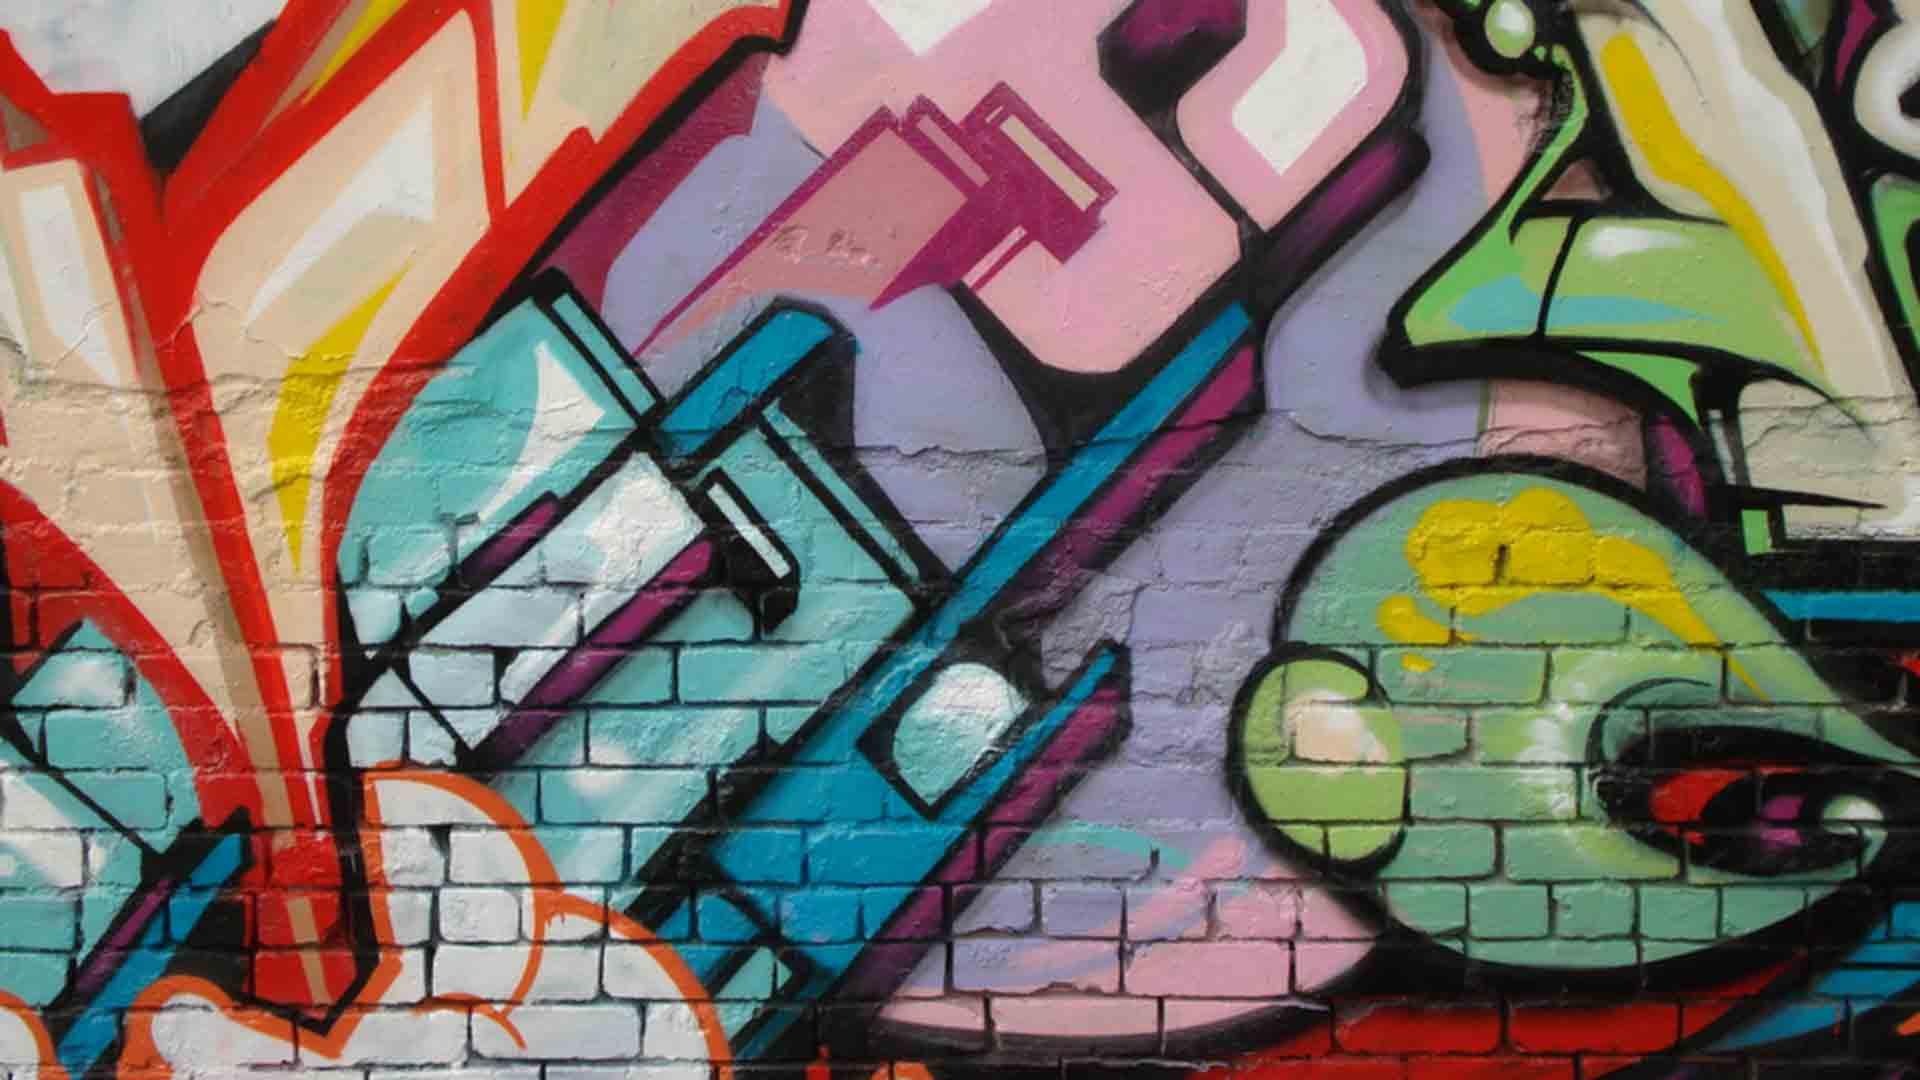 Graffiti backgrounds 18389 1920x1080 px hdwallsource graffiti backgrounds 18389 voltagebd Image collections